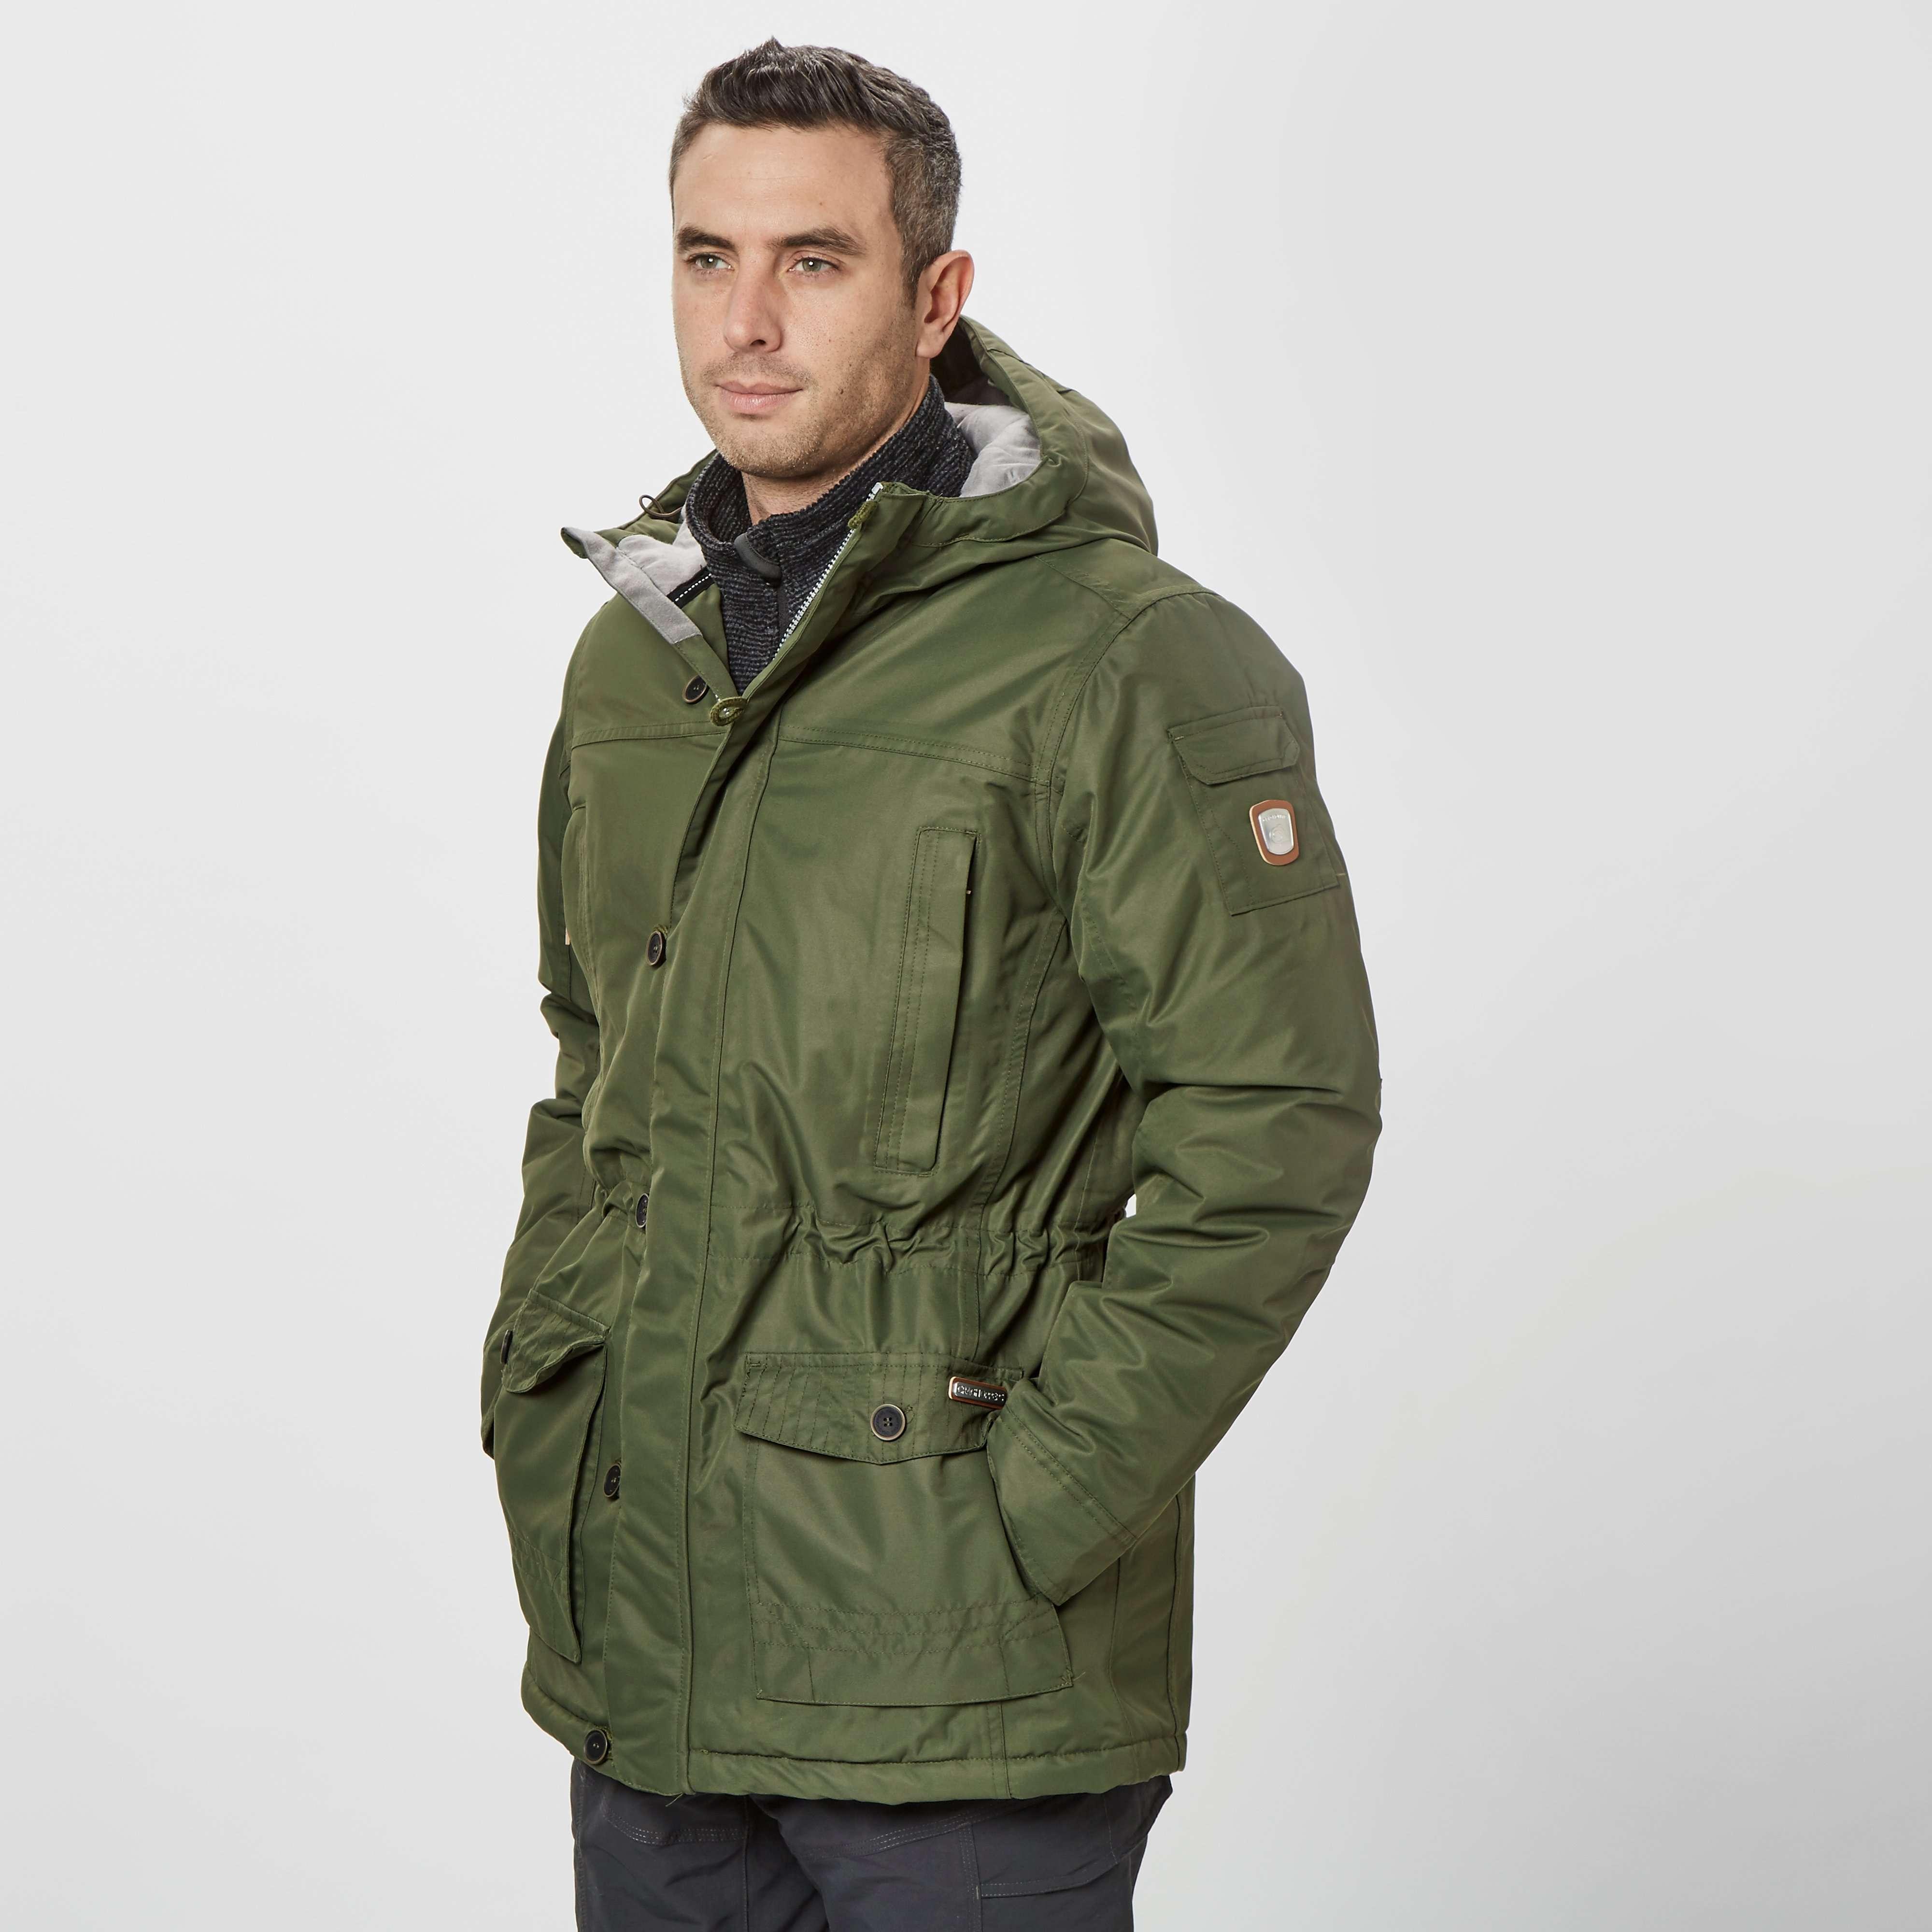 CRAGHOPPERS Men's Finch Jacket